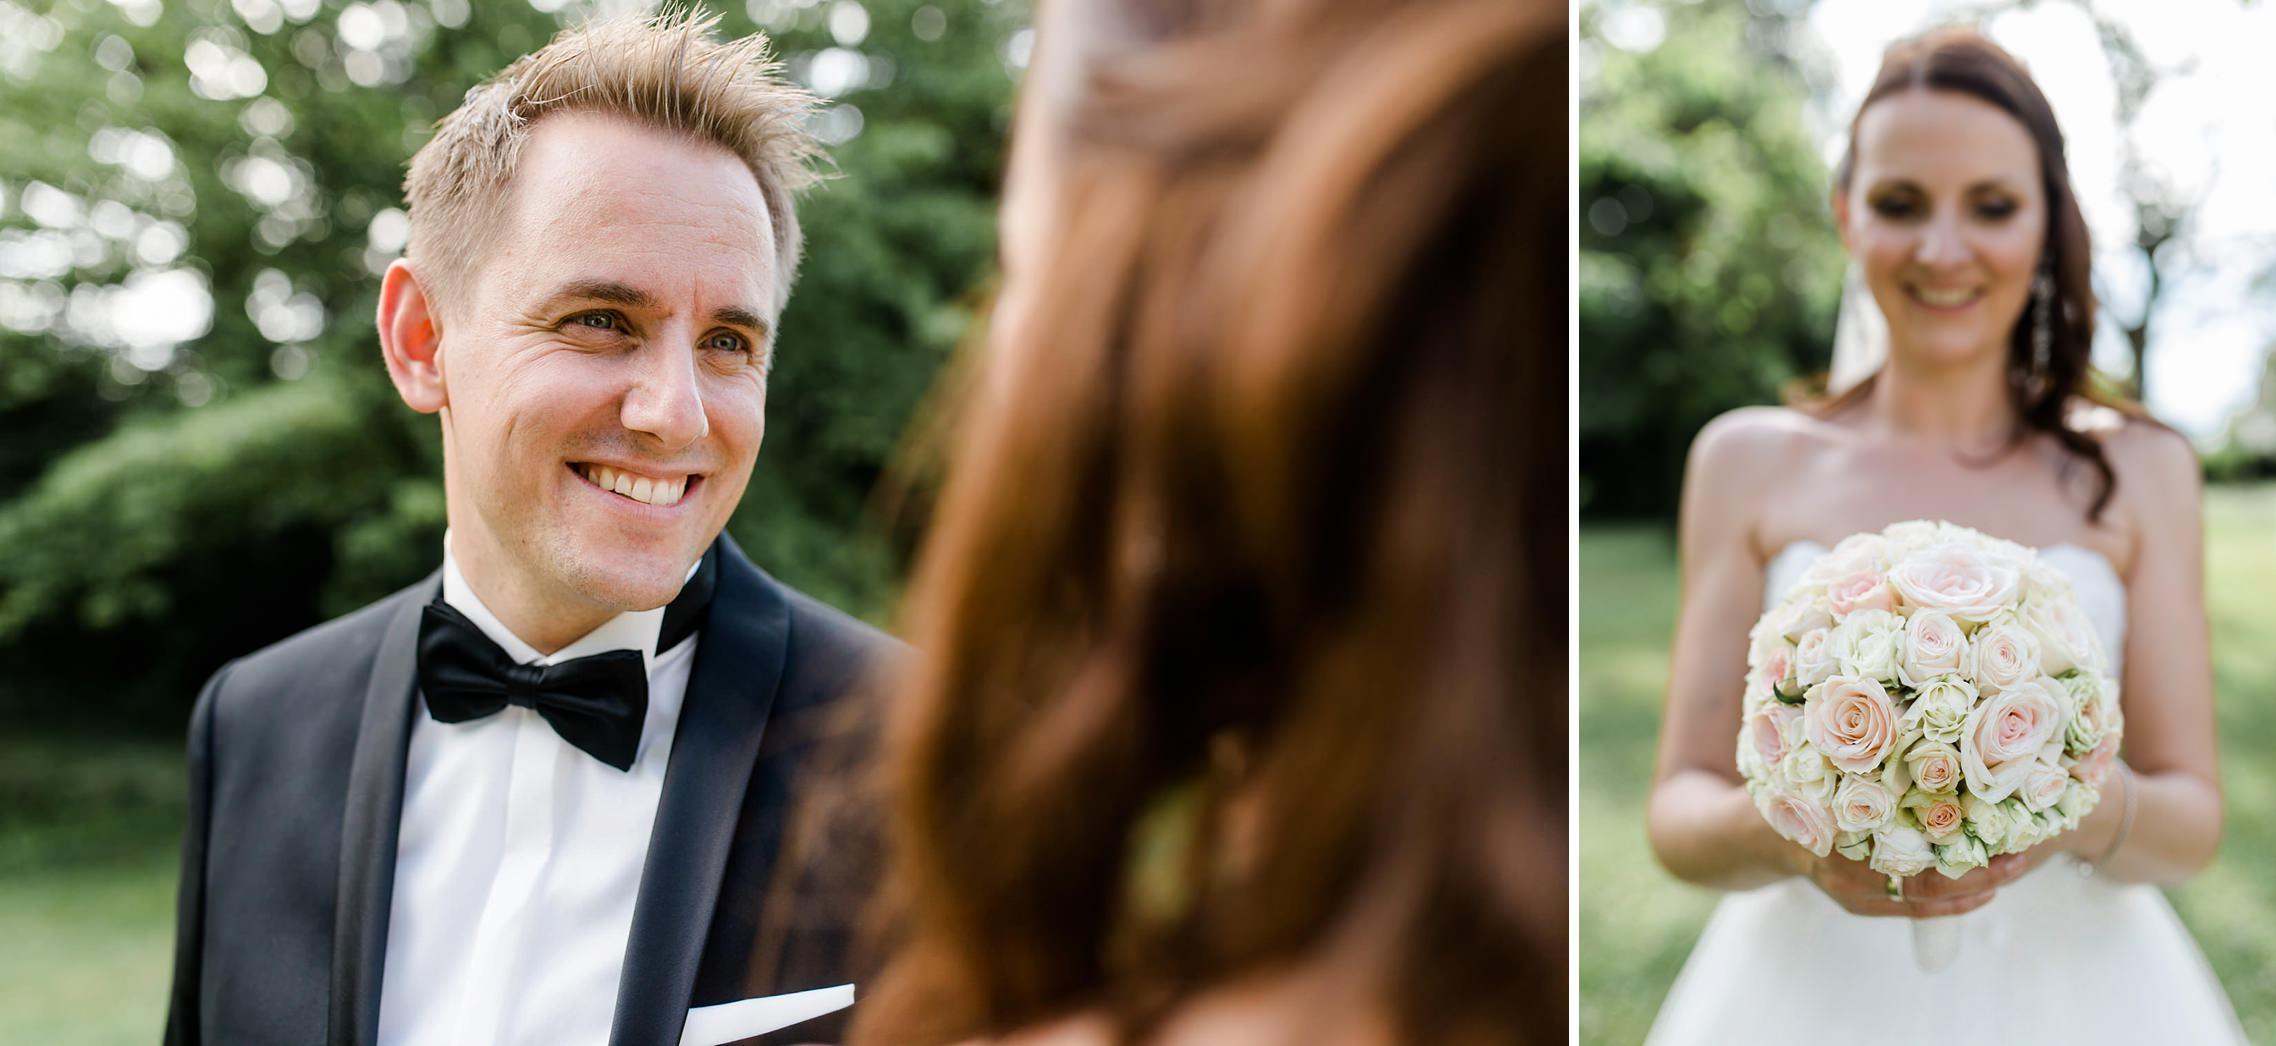 Portraitshooting mit Brautpaar